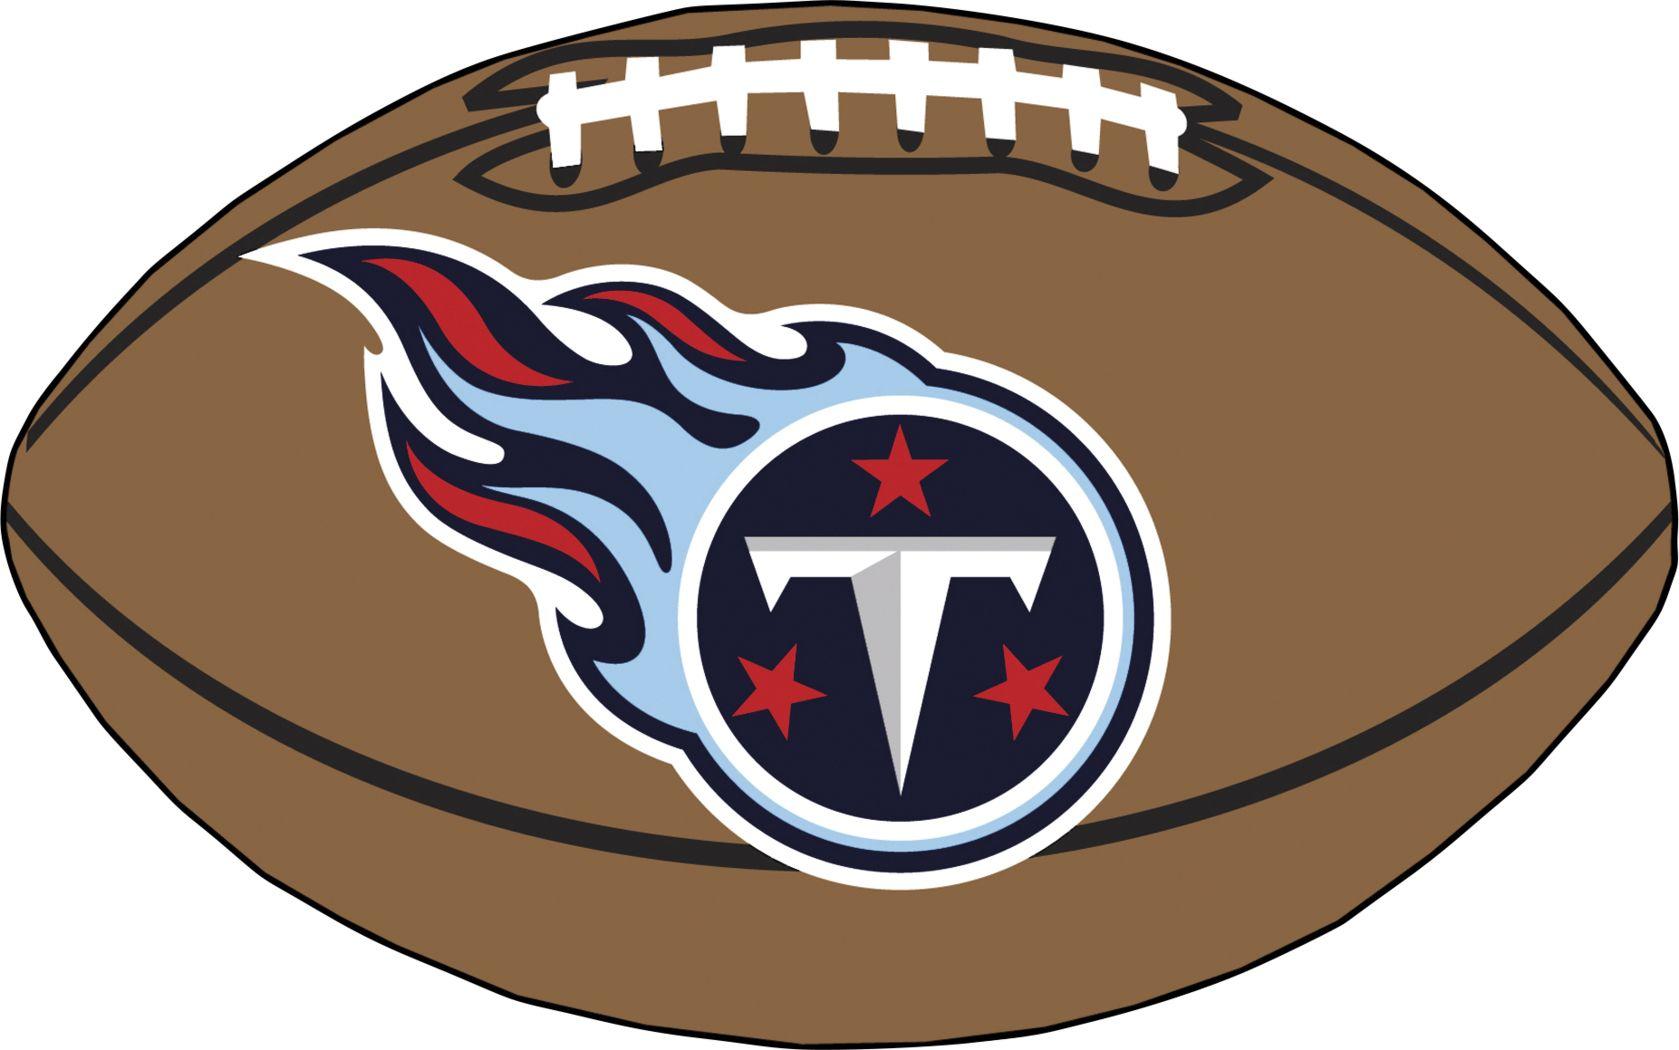 NFL Football Mascot Tennessee Titans 1'6 x 1'10 Rug